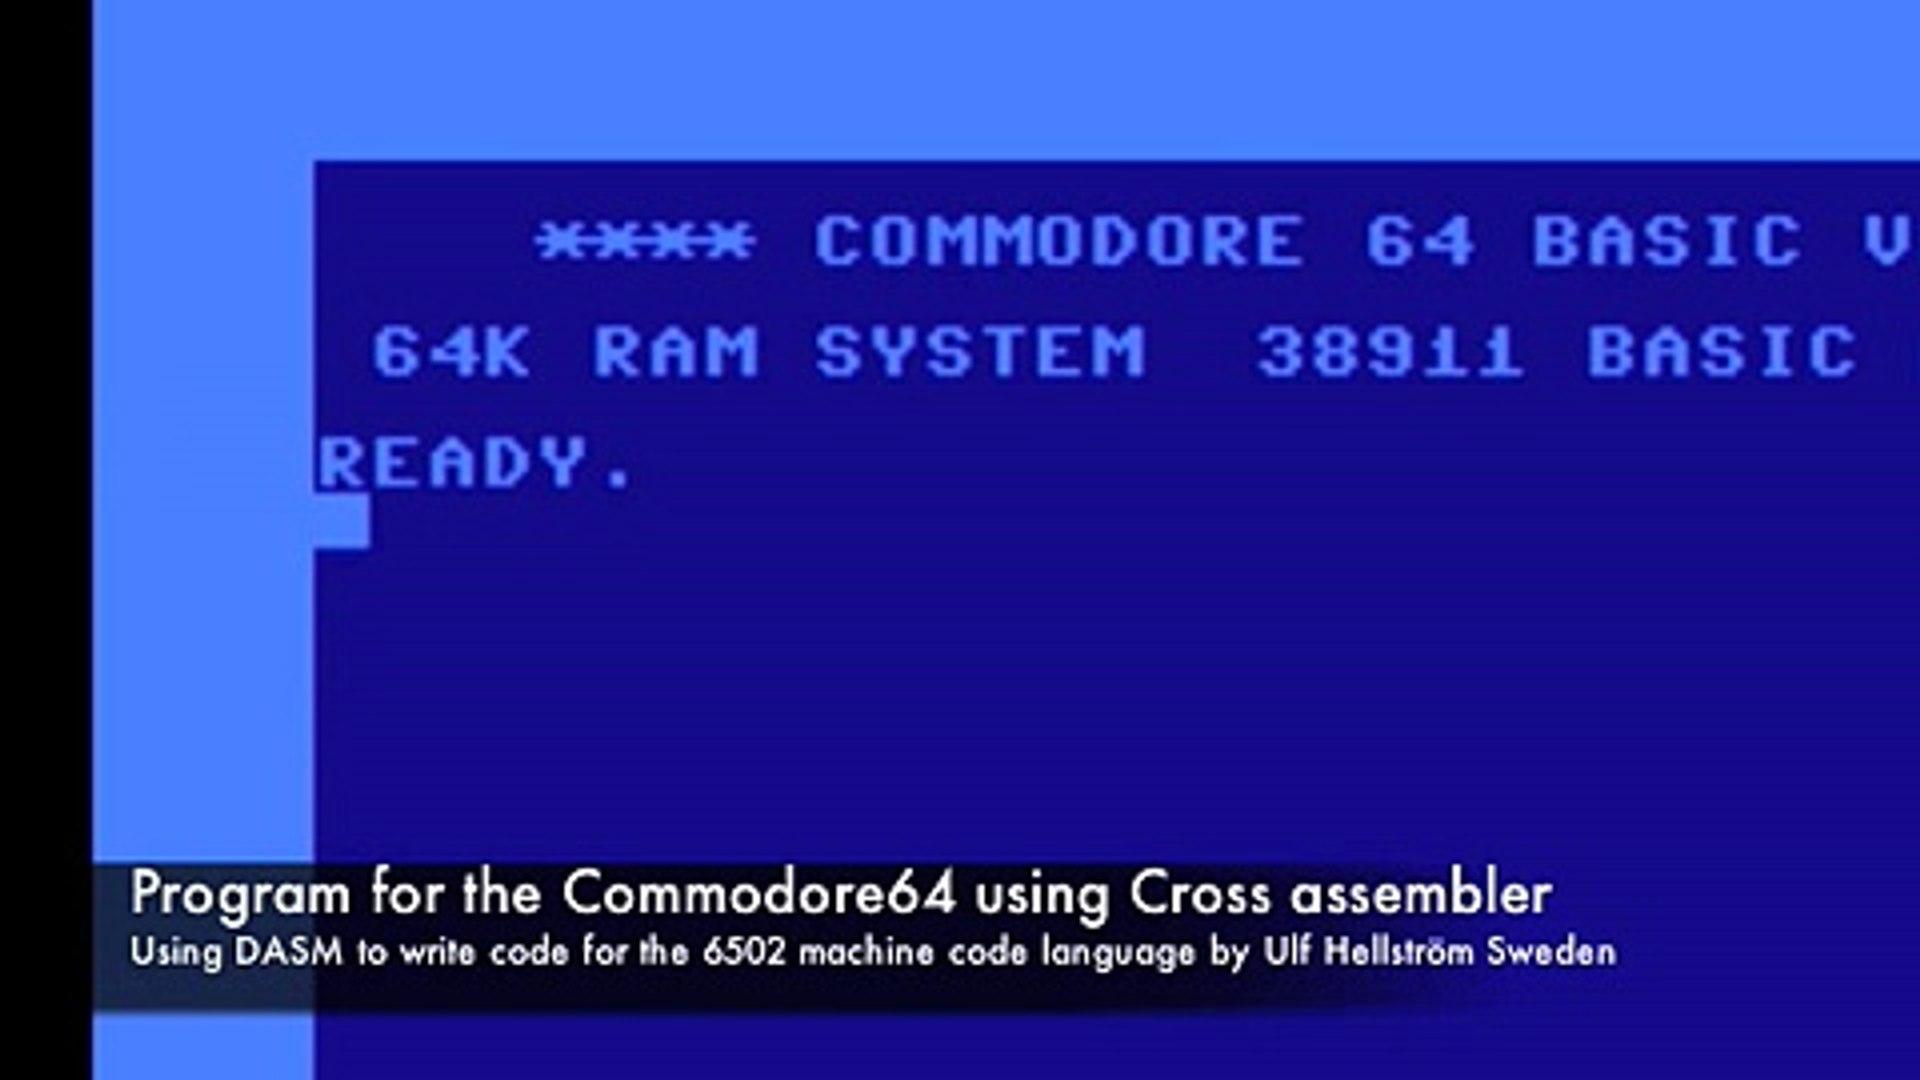 Using DASM Cross Assembler to write code for C64